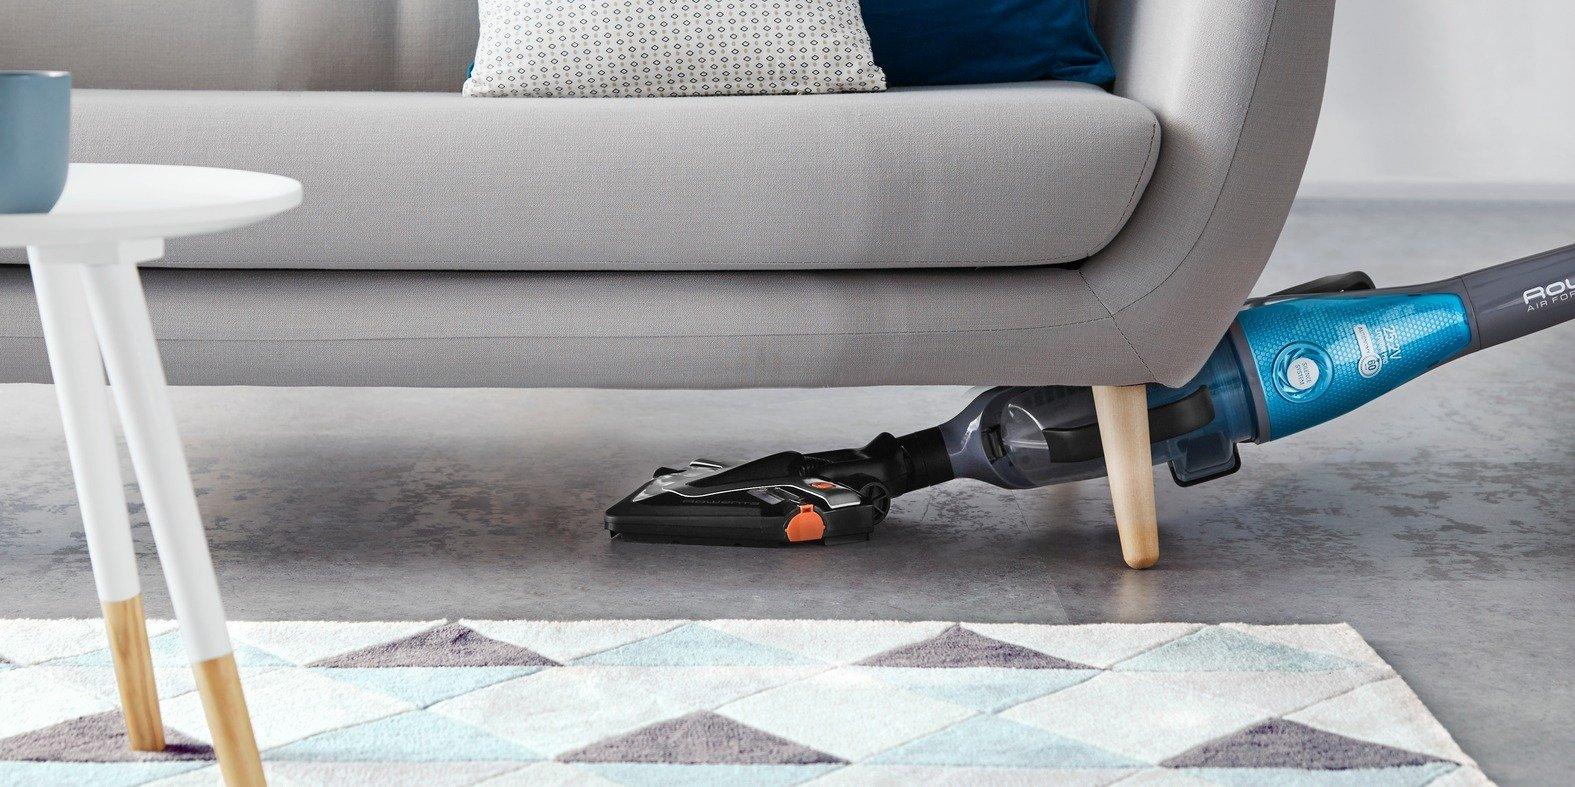 Aspiradores verticais Rowenta para uma limpeza funcional e eficiente